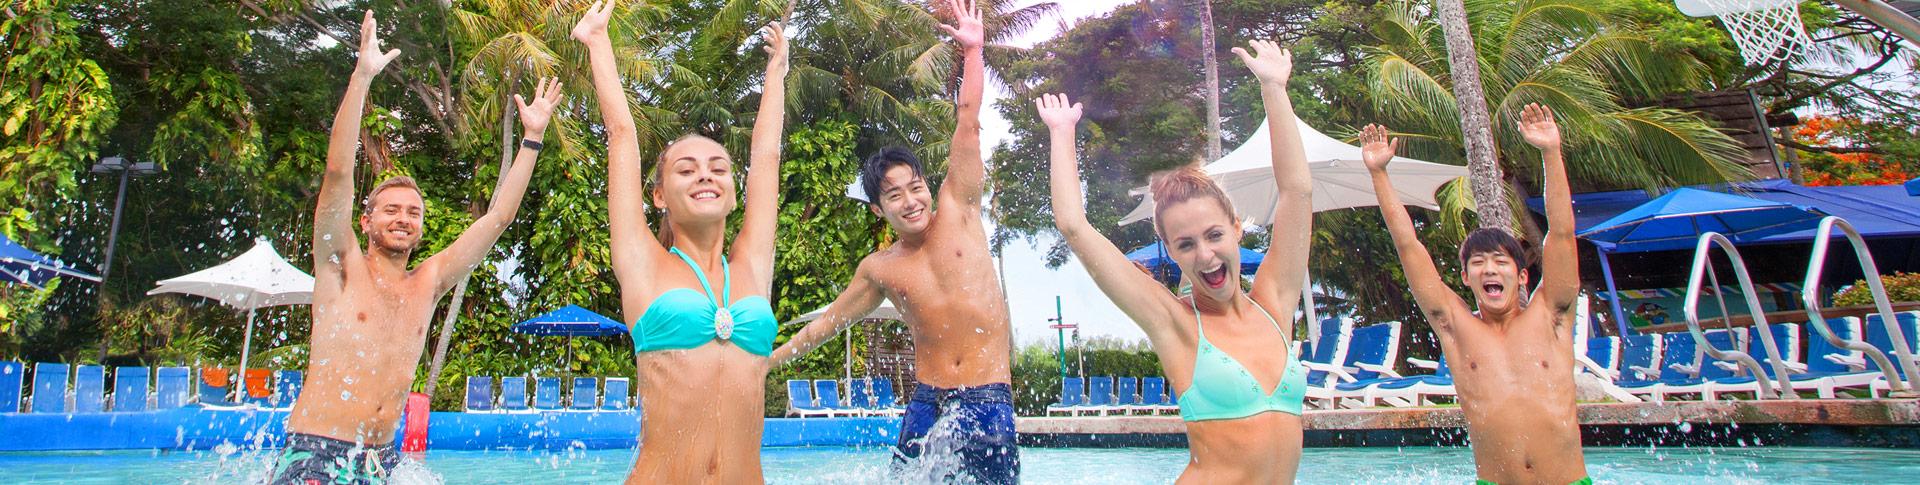 Tumon, Resort Services of Pacific Islands Club Guam